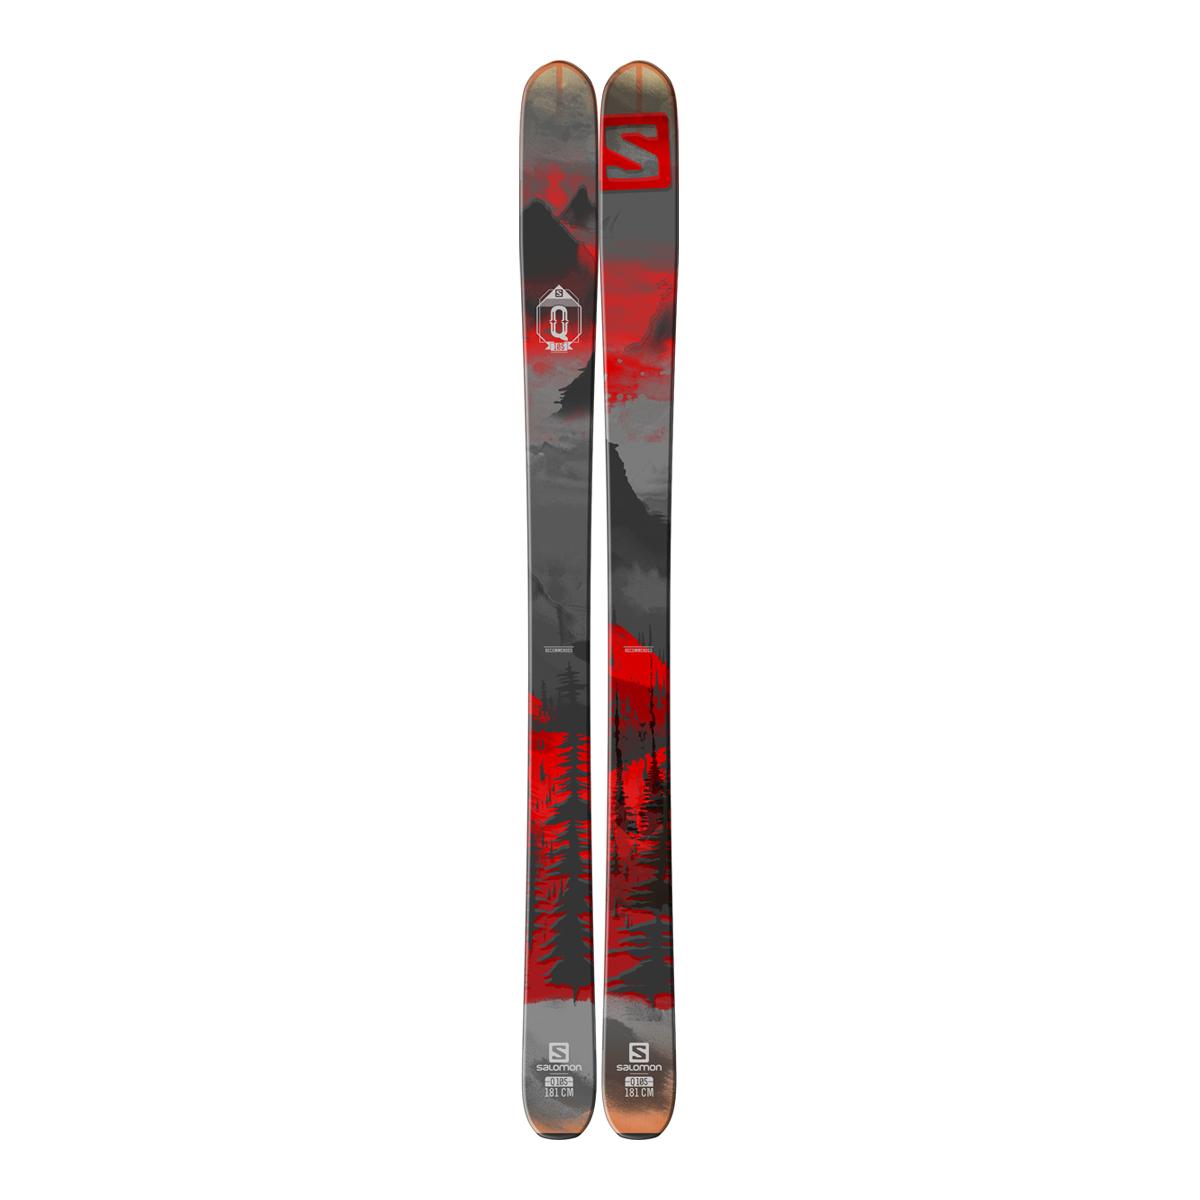 Salomon Q 105 2016 Ski 100 109mm All Mountain Ski